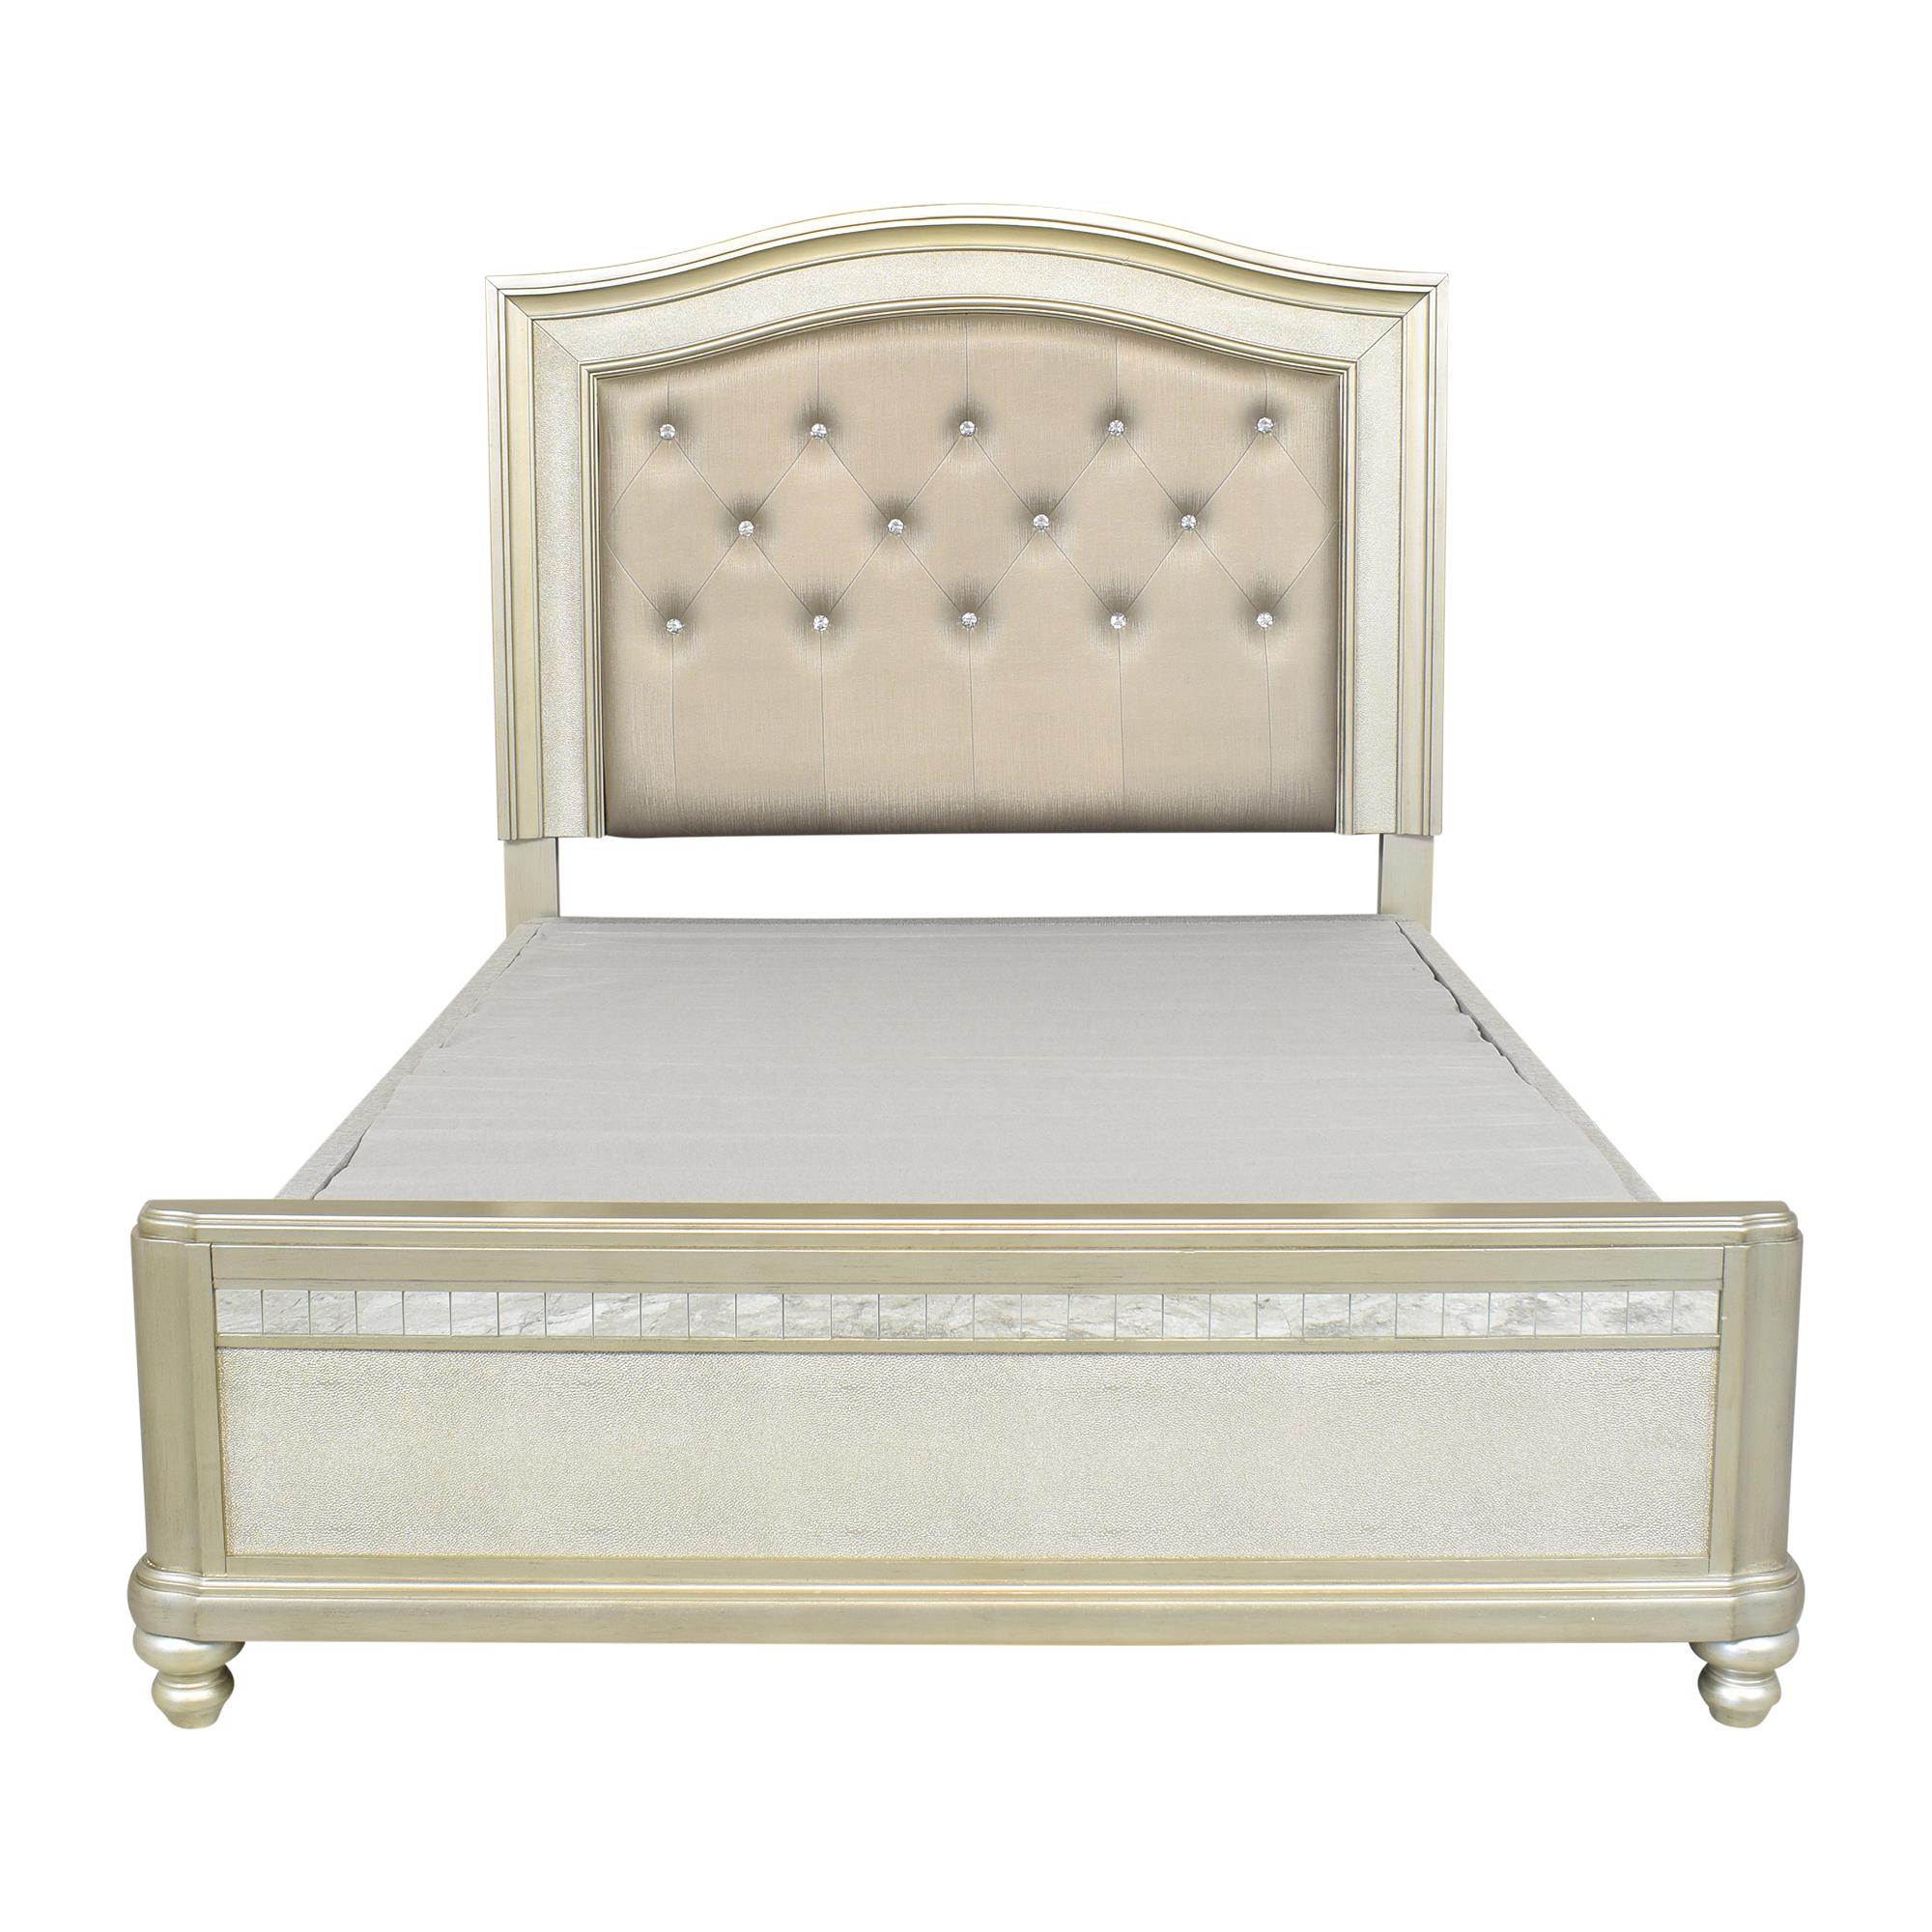 buy Wayfair Annunziata Upholstered Standard Queen Bed Wayfair